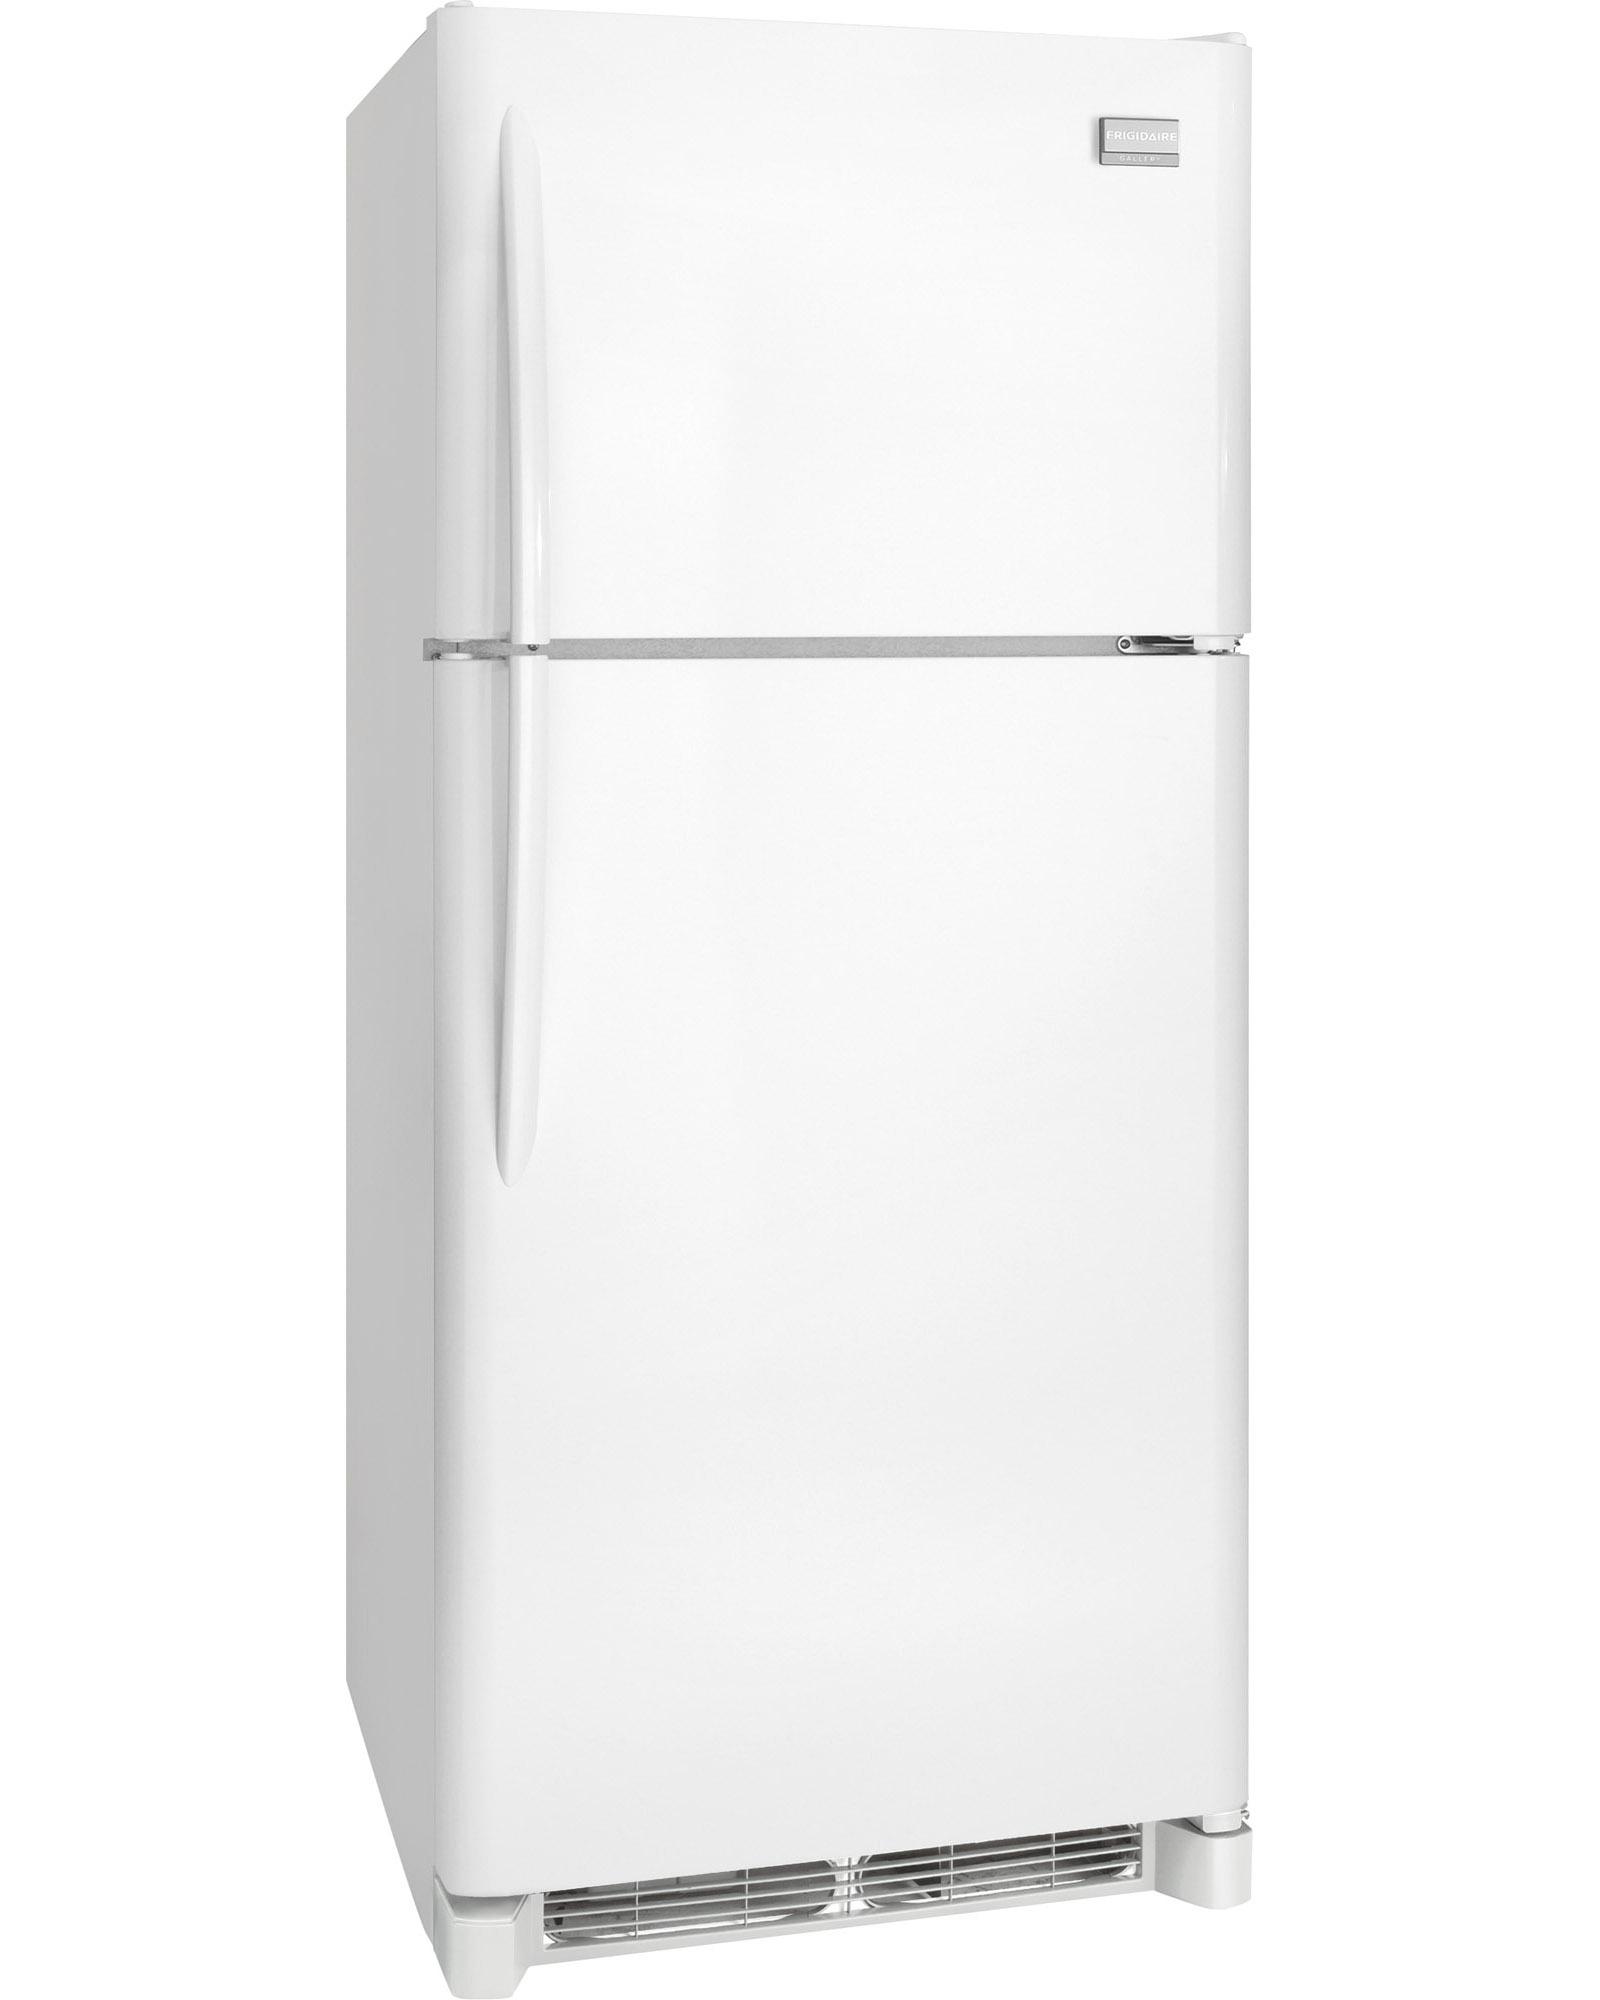 Frigidaire Gallery FGHT2046QP 20.4 cu. ft. Top Freezer Refrigerator - White